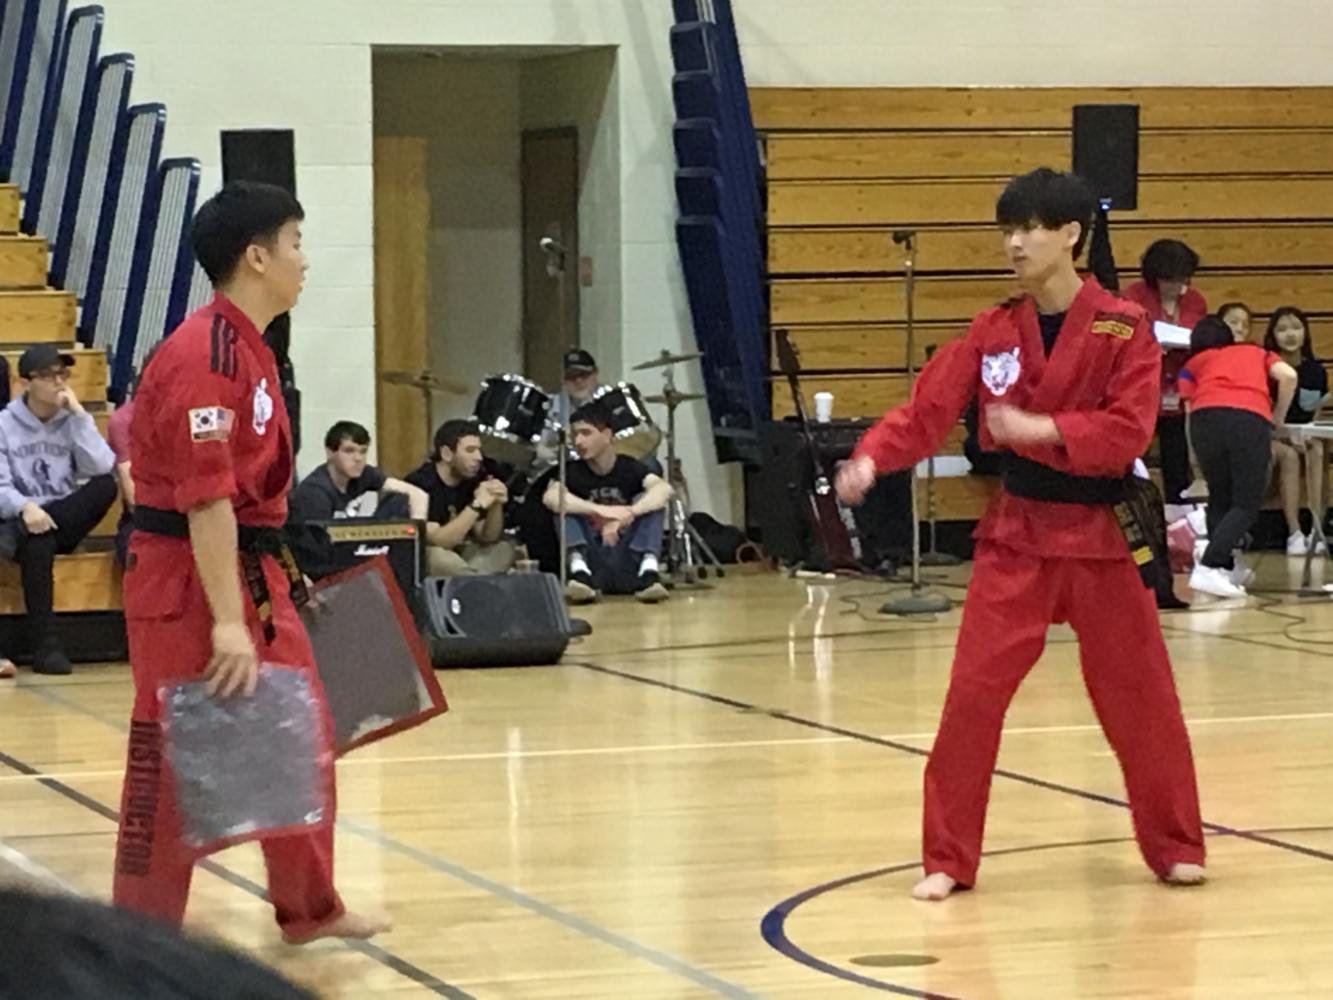 At Diversity Day, students demonstrated their taekwondo skills.